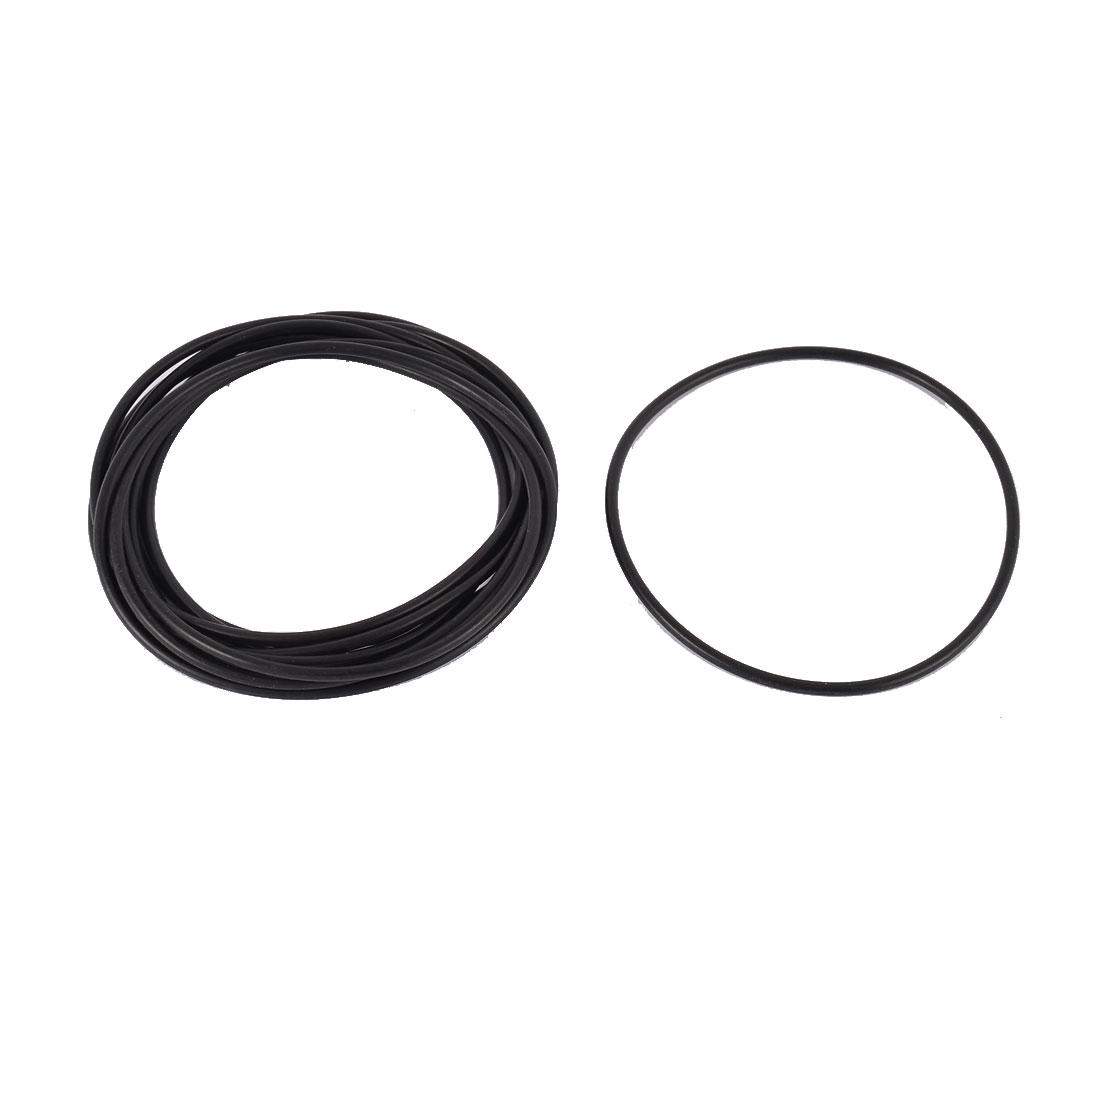 75mm x 2.5mm Rubber Sealing Oil Filter Flexible O Rings Gaskets Black 10 pcs